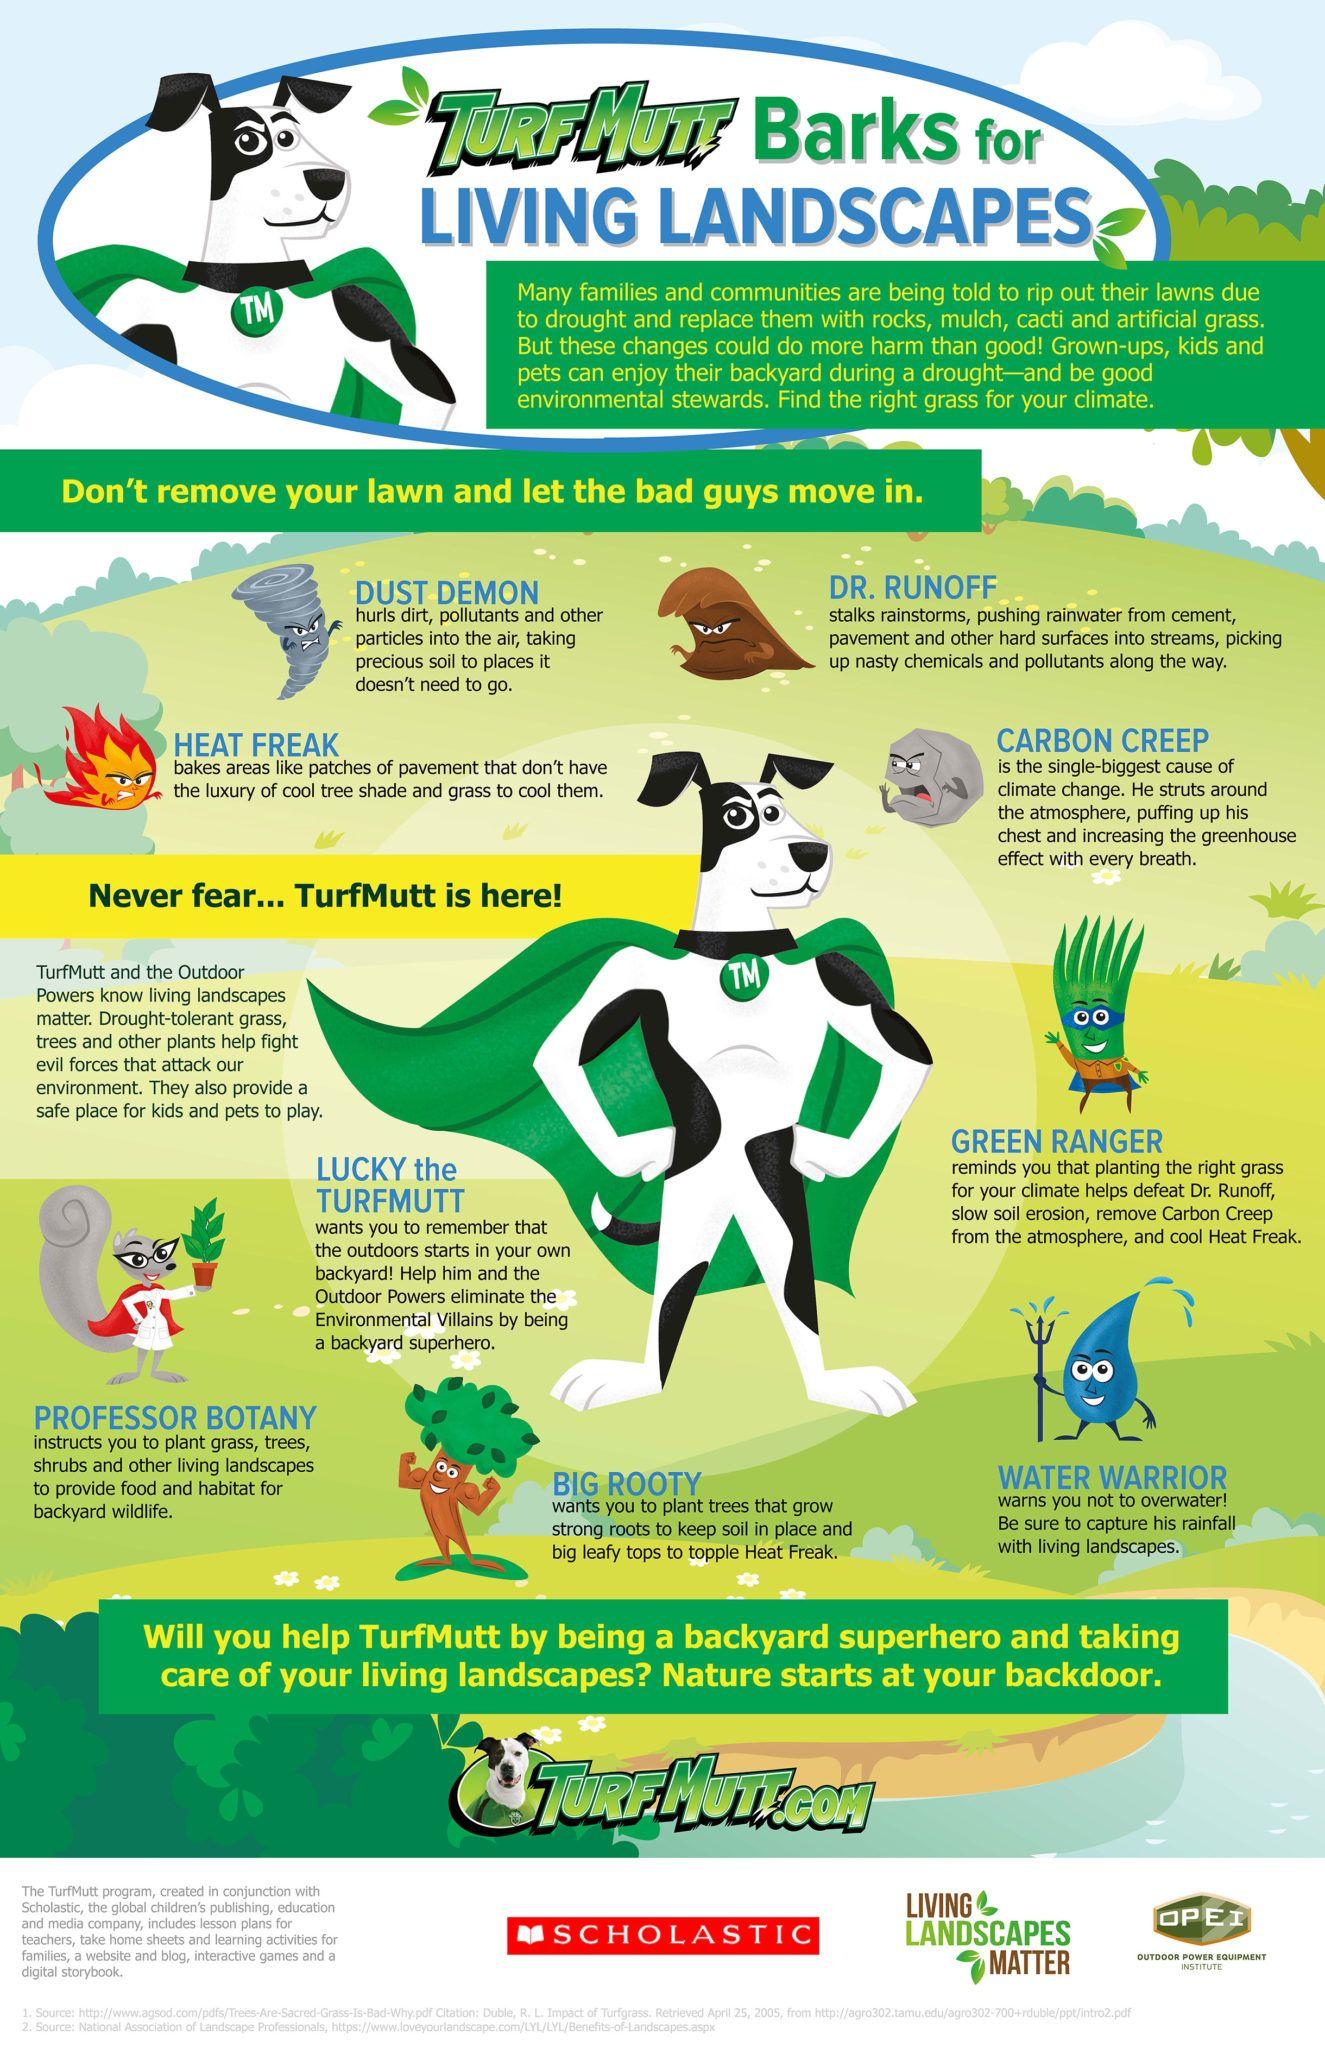 TurfMutt Barks for Living Landscapes | Backyard | Lawn care